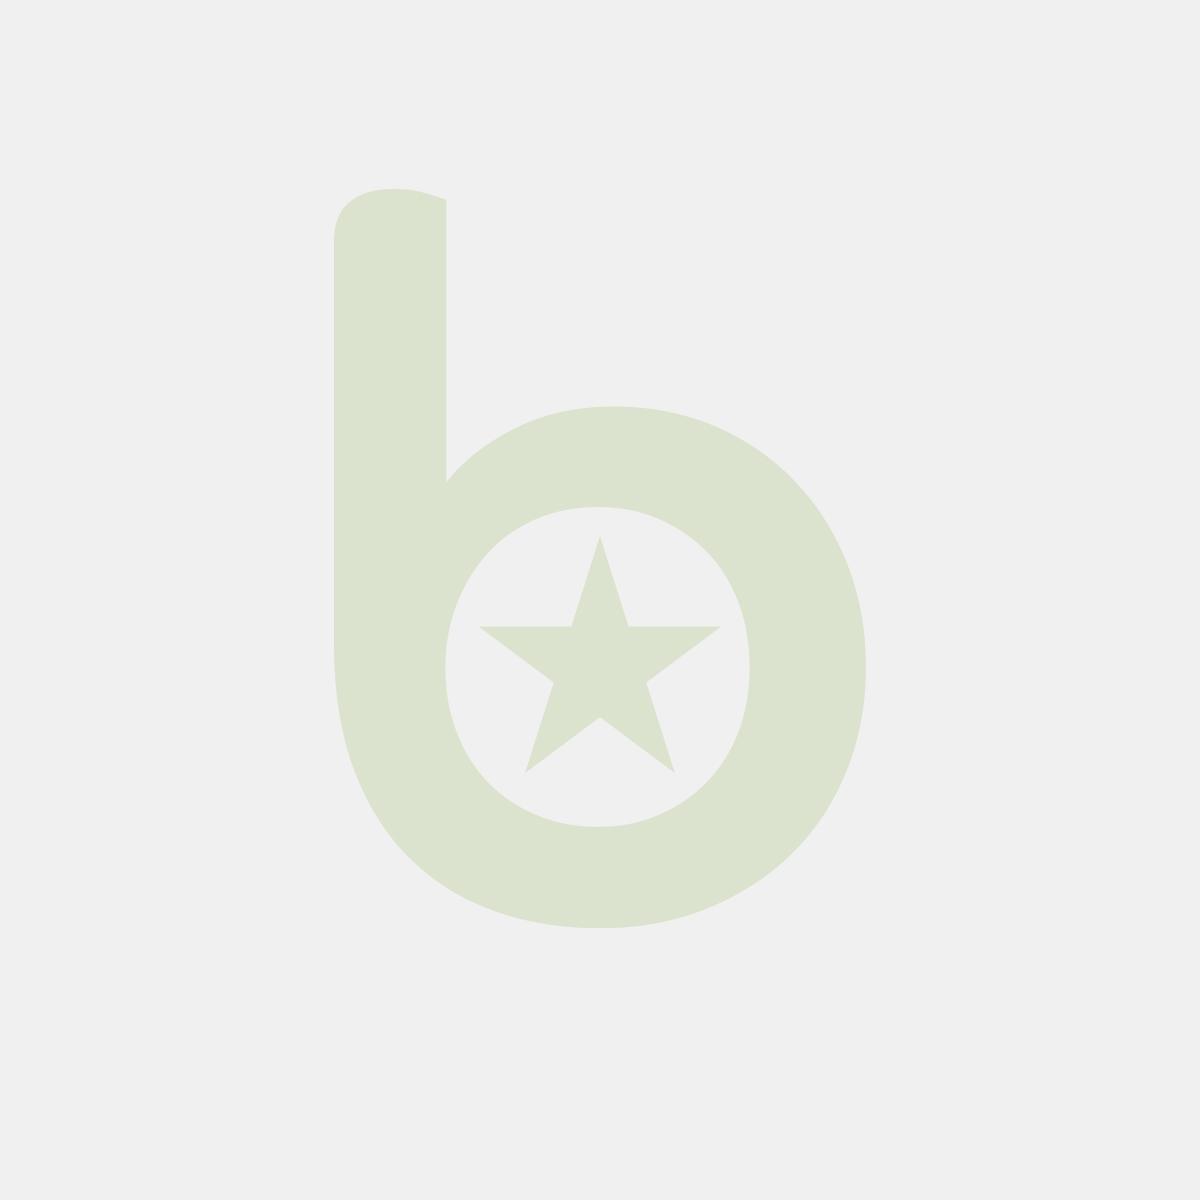 Podkładka pod nadgarstek KENSINGTON Duo Gel, niebieko-czarna